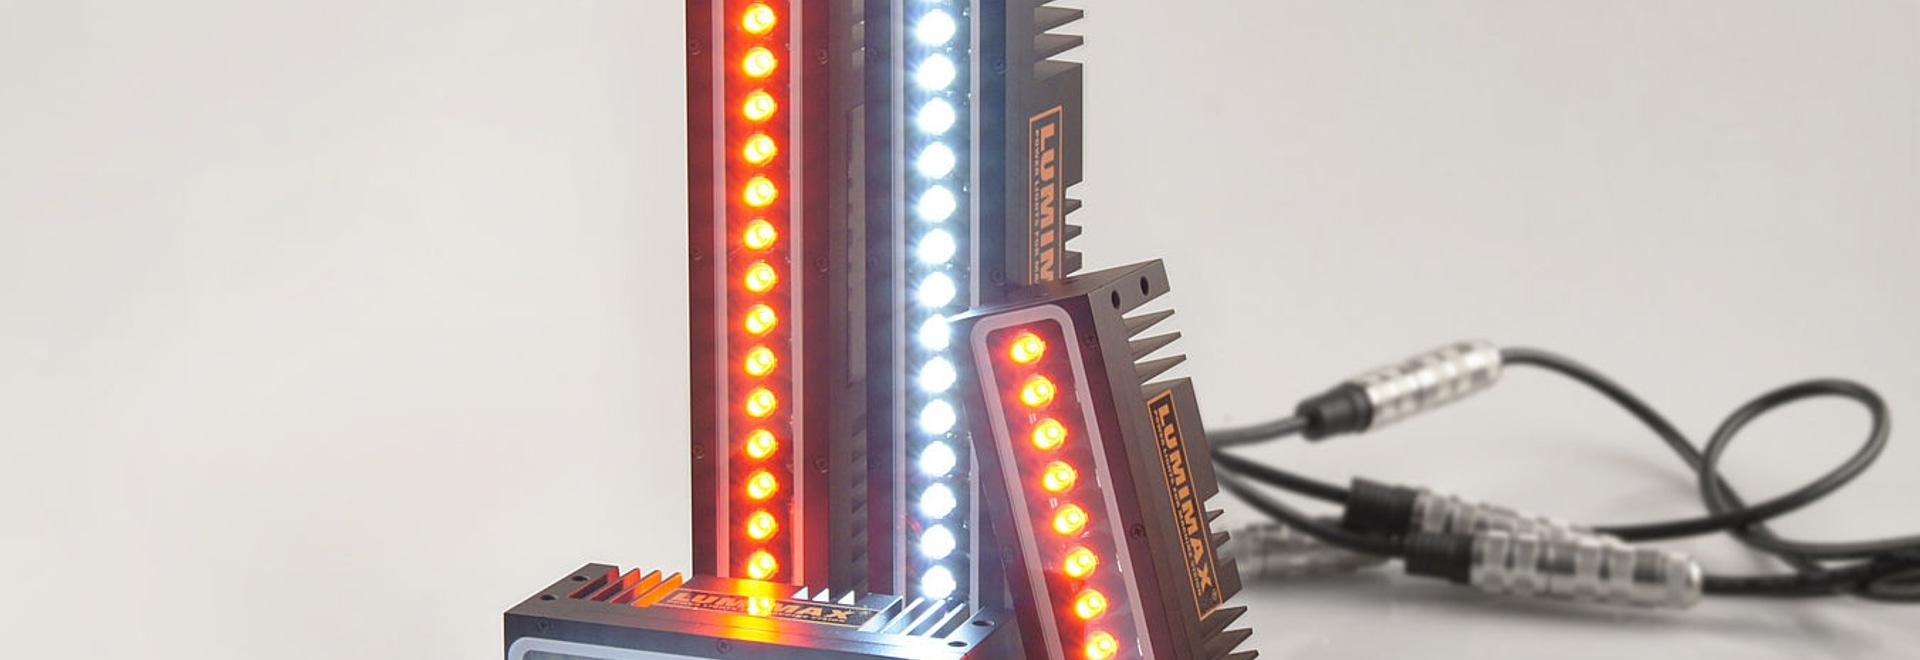 LED Bar Lights by LUMIMAX®